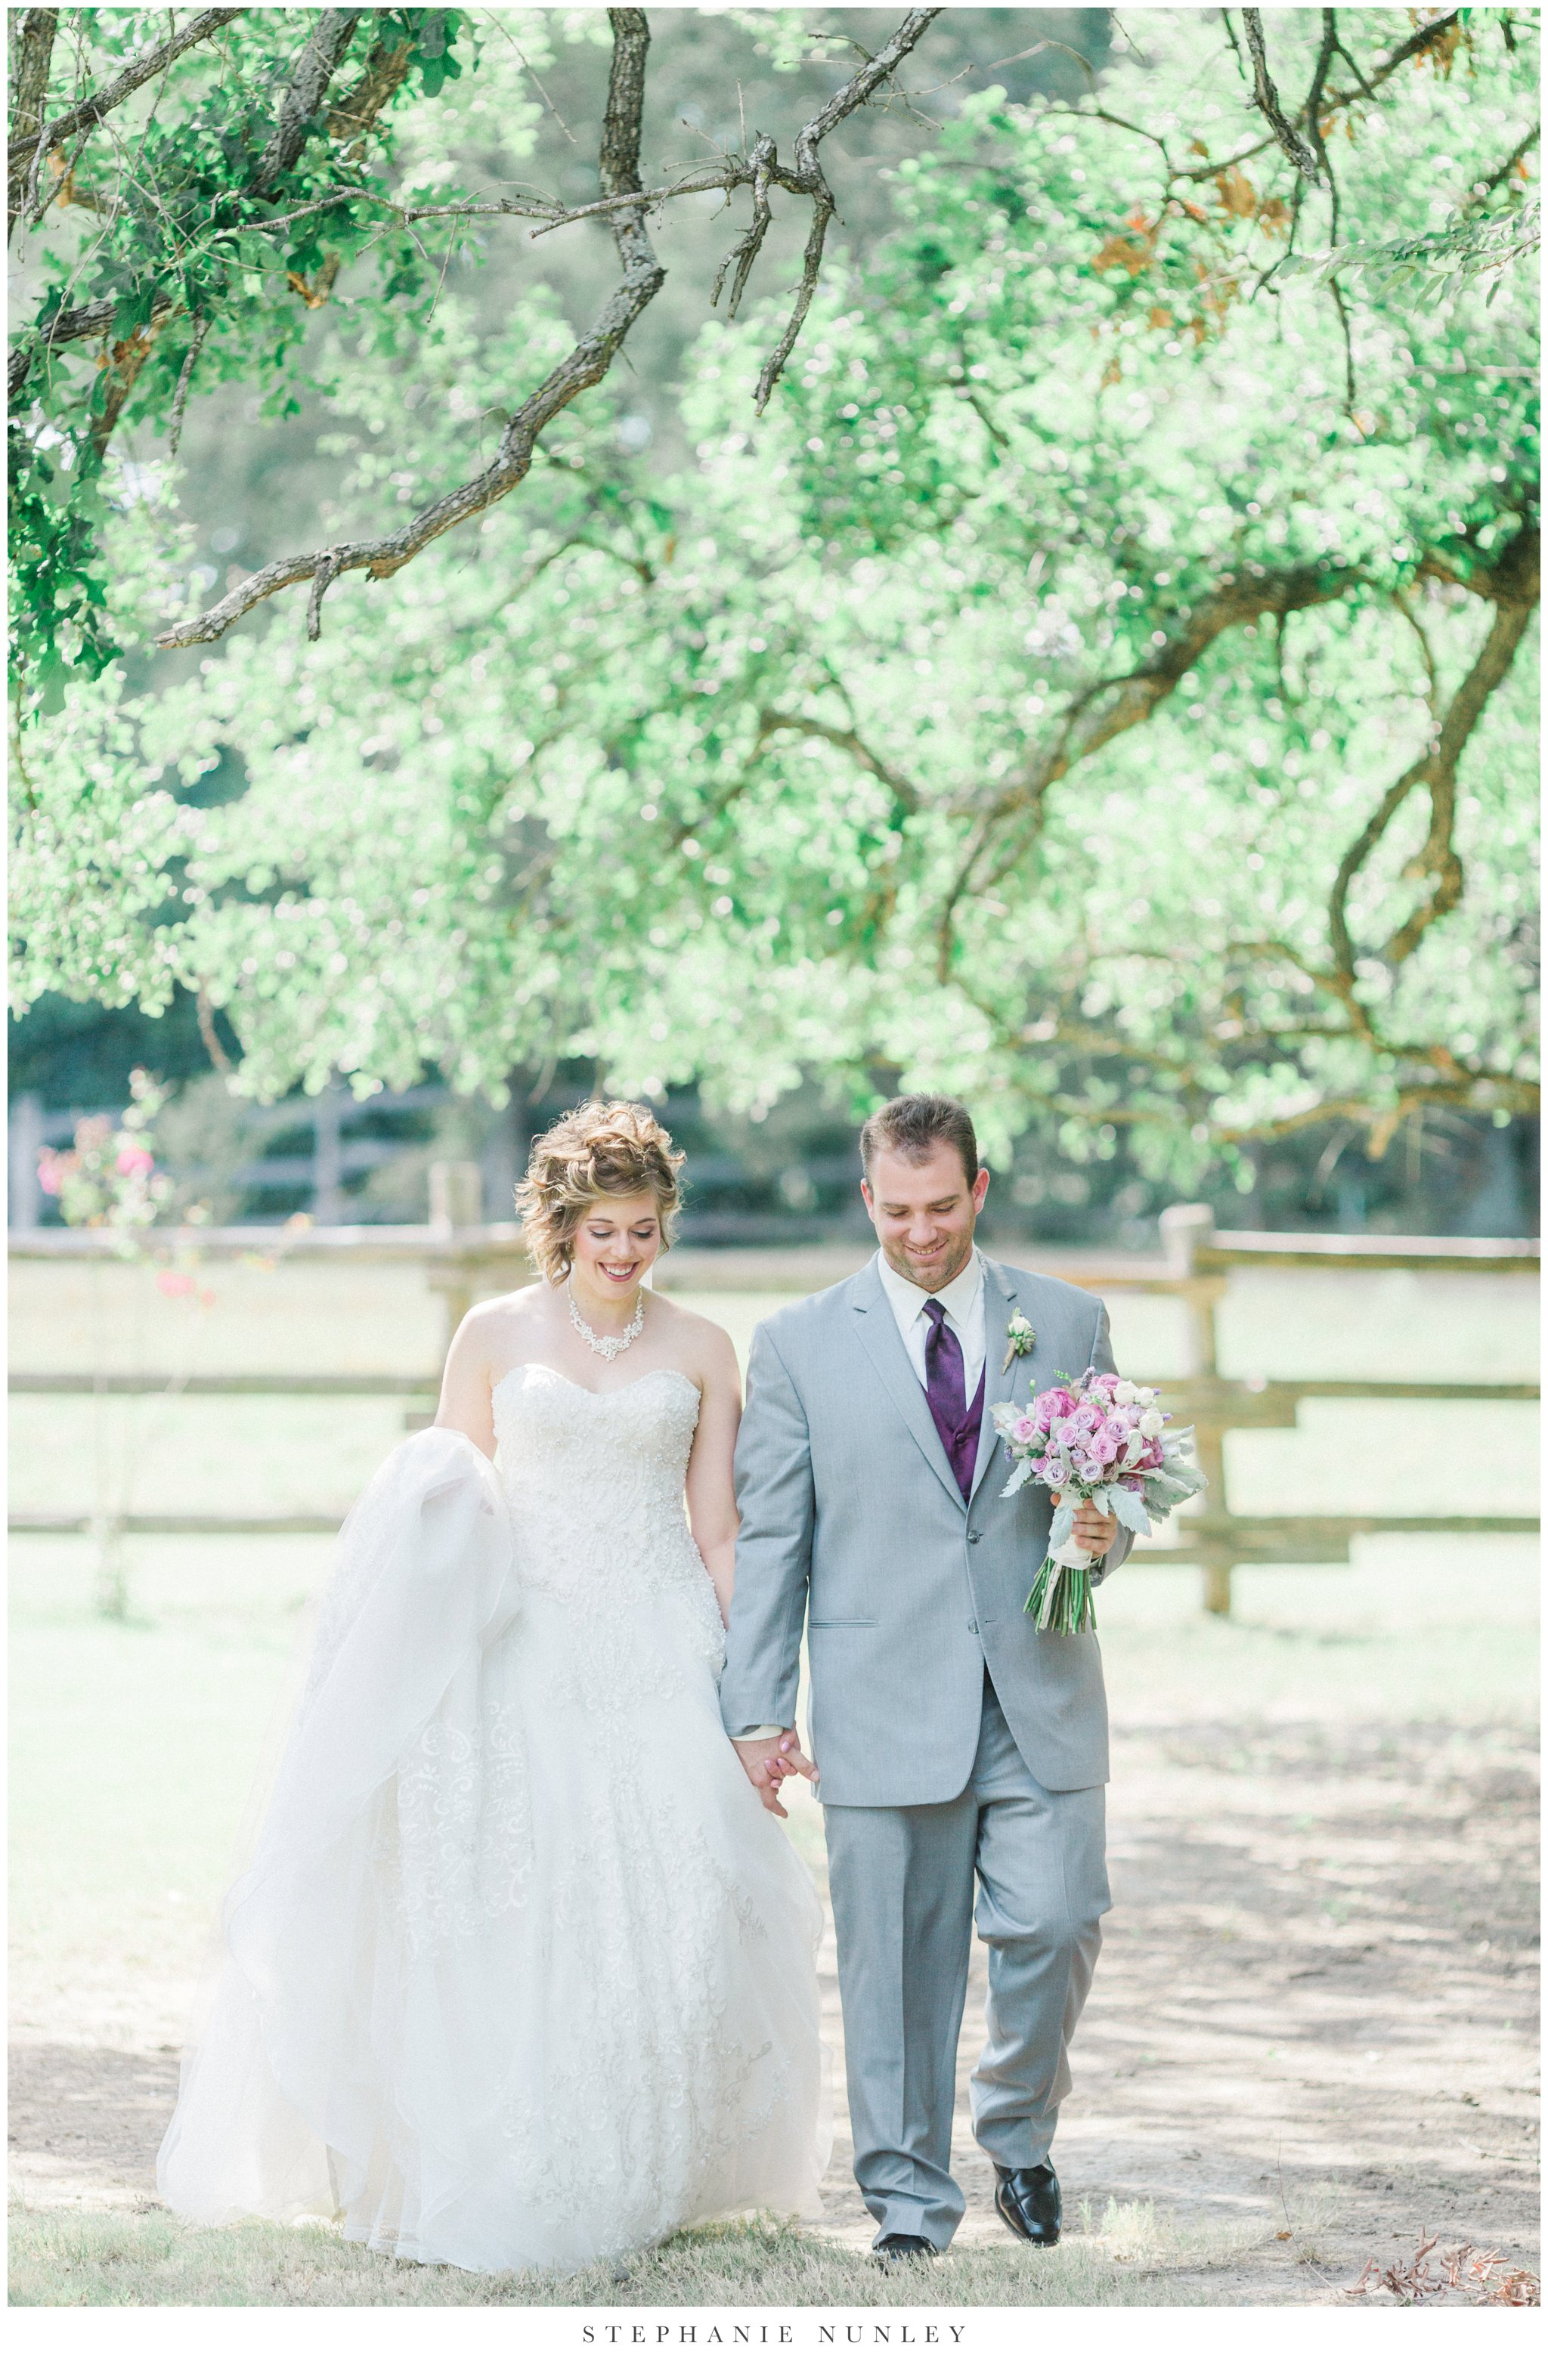 southern-classy-outdoor-barn-wedding-photos-0036.jpg